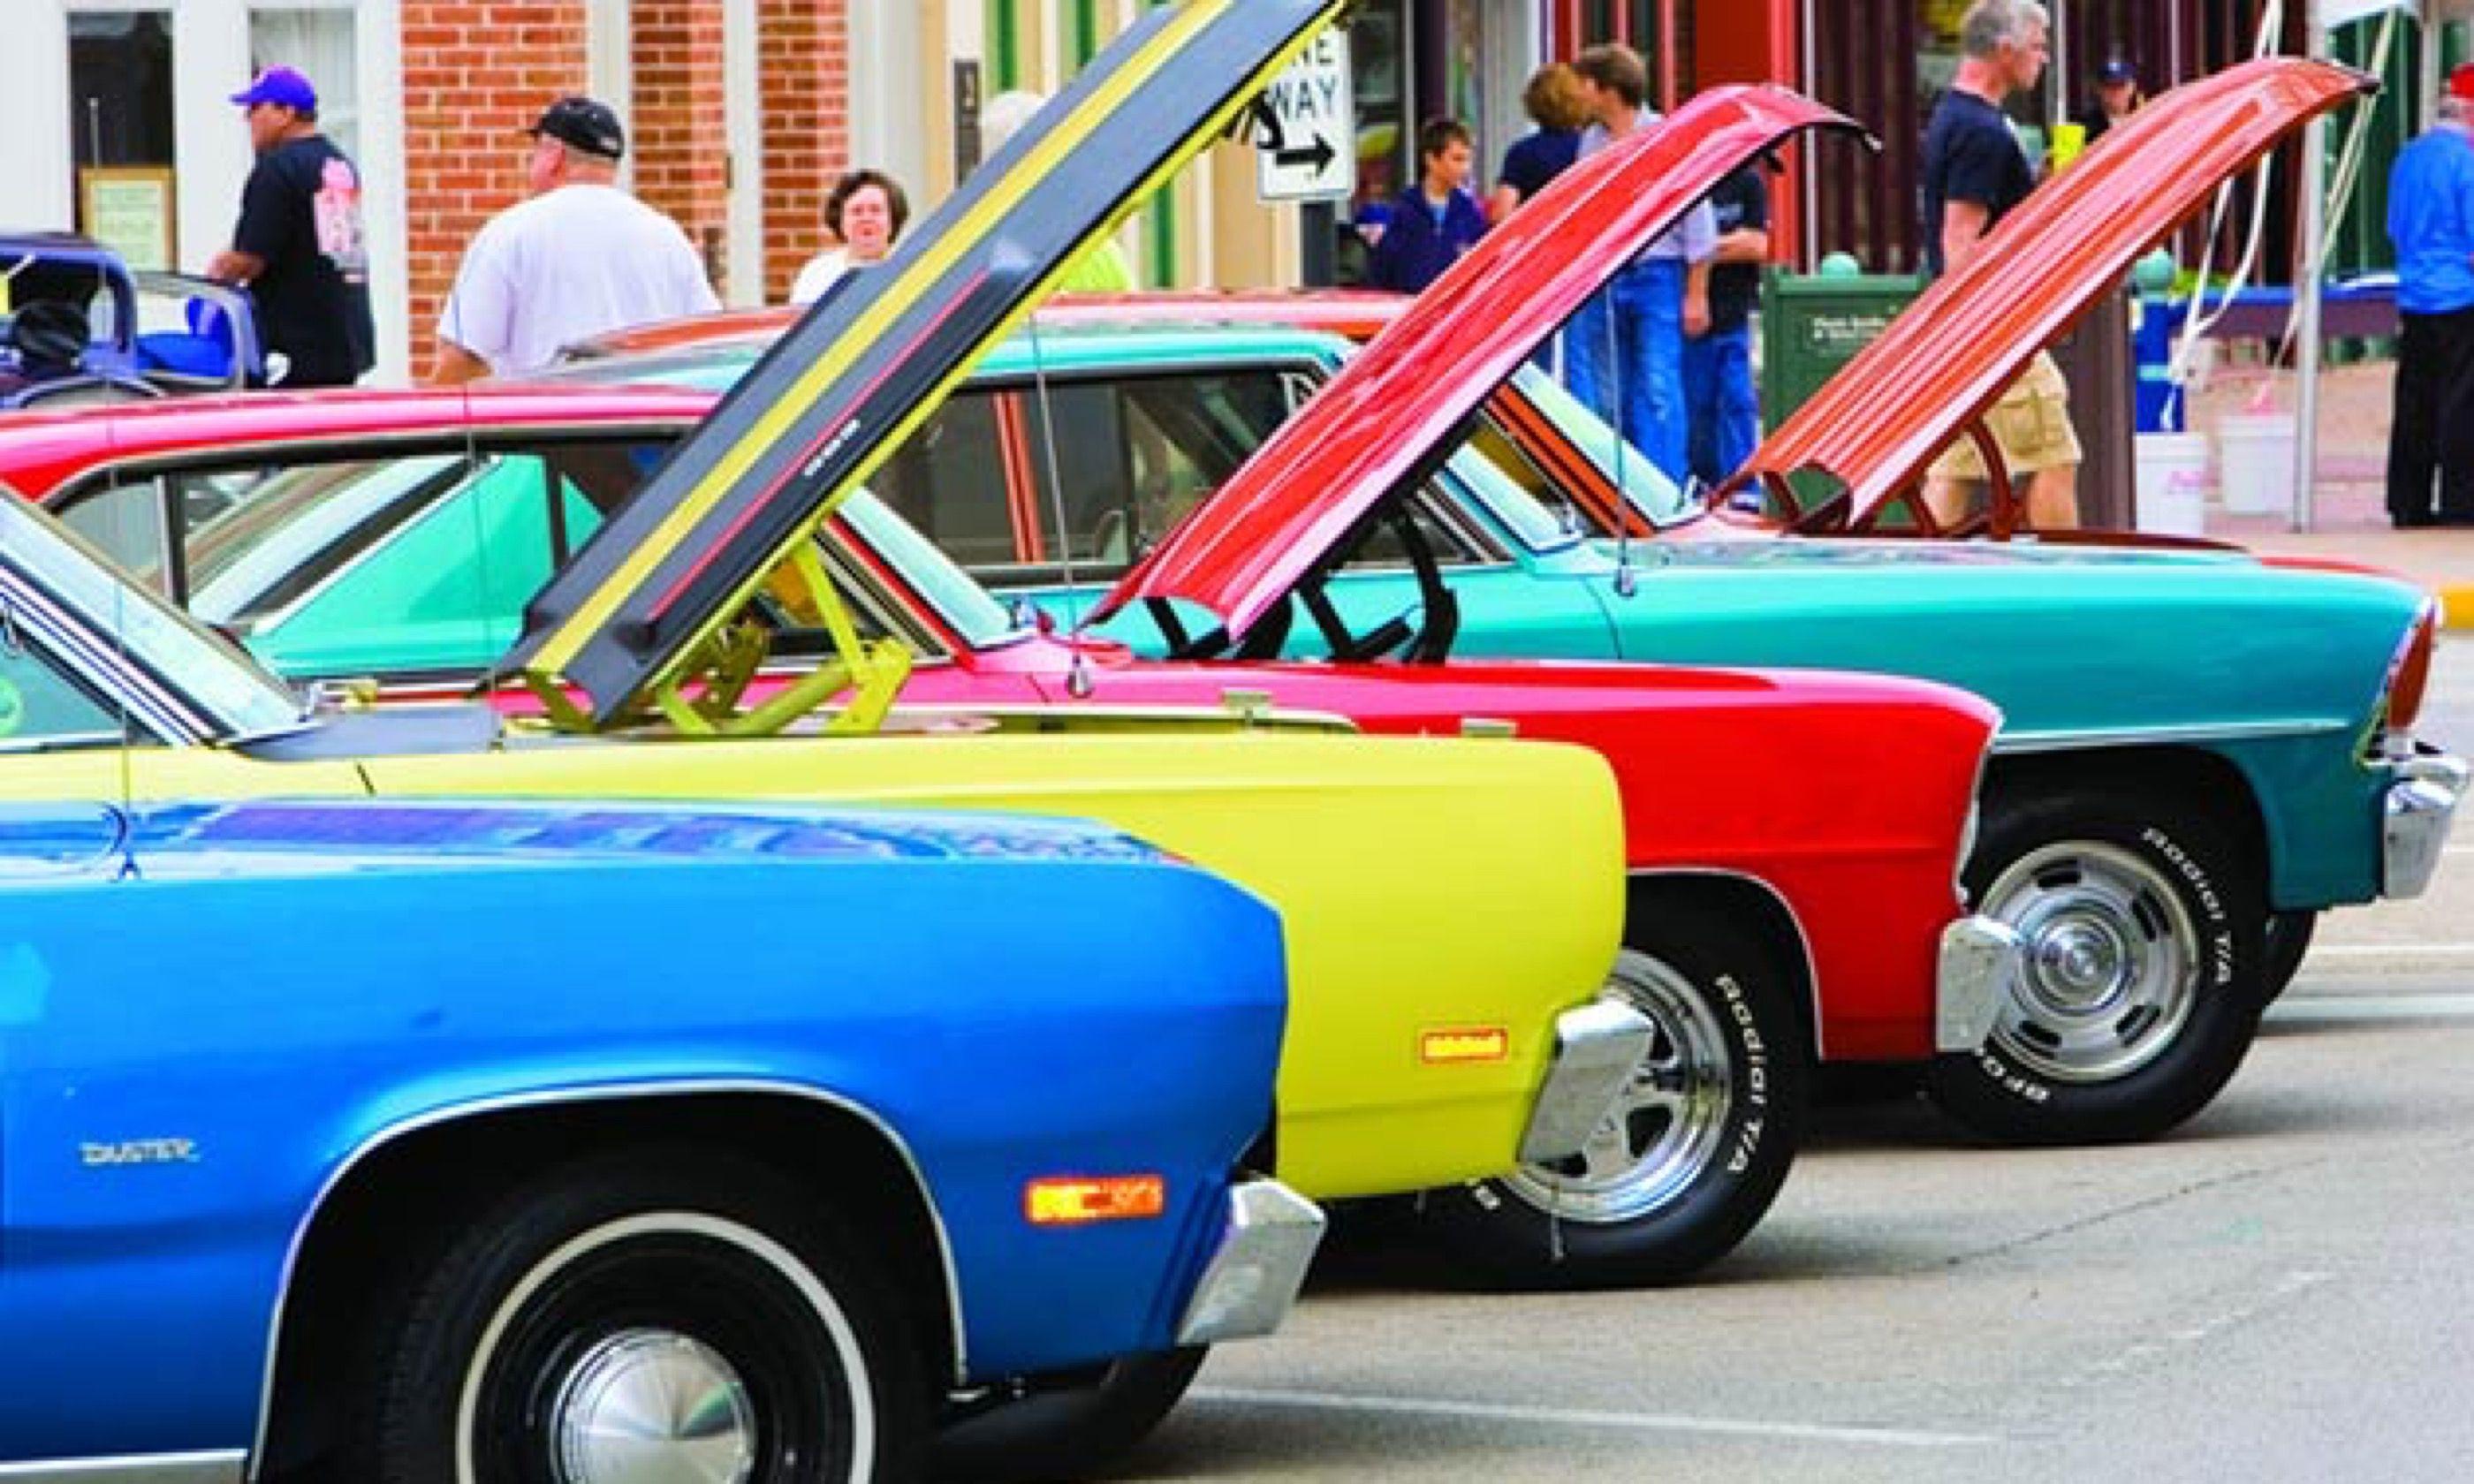 Classic cars in Springfield (www.enjoyillinois.com)